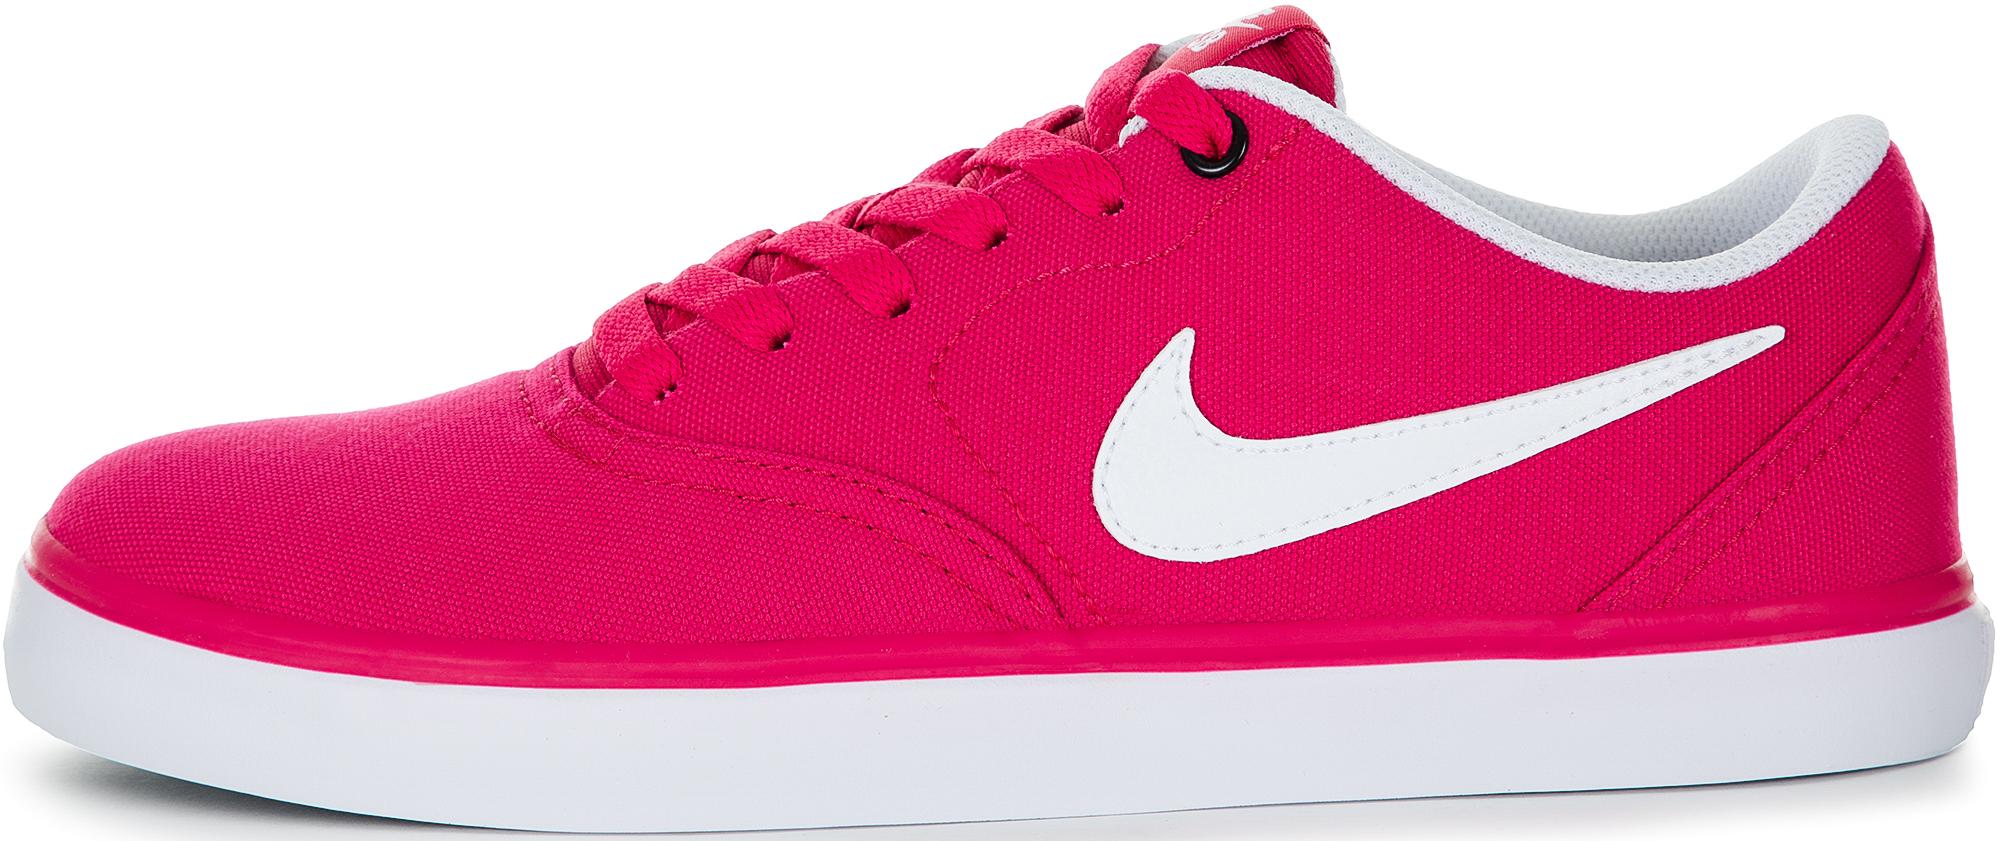 Nike Кеды женские SB Check Solarsoft, размер 37,5